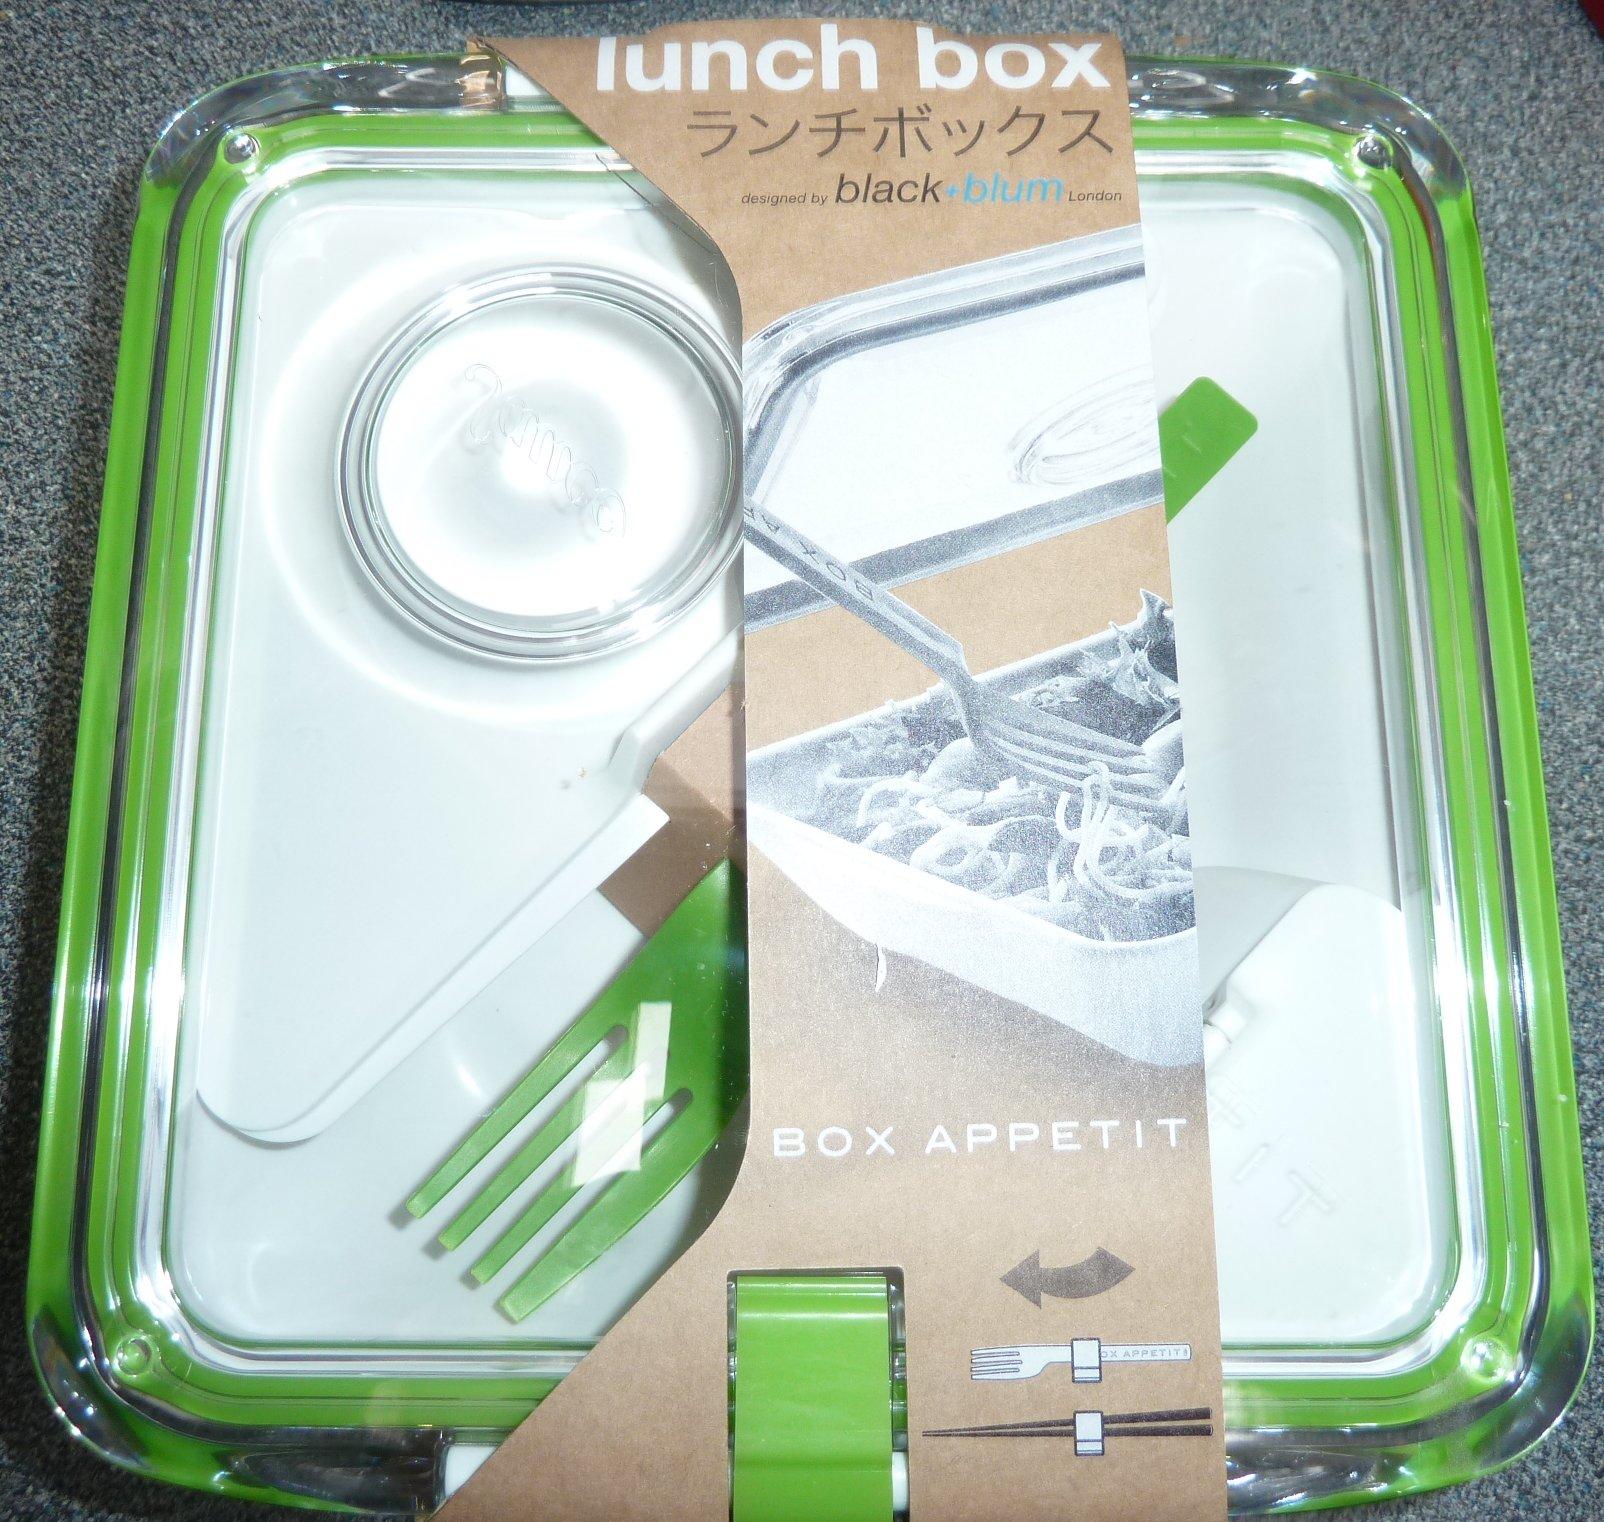 Box Appetit Lunch Box